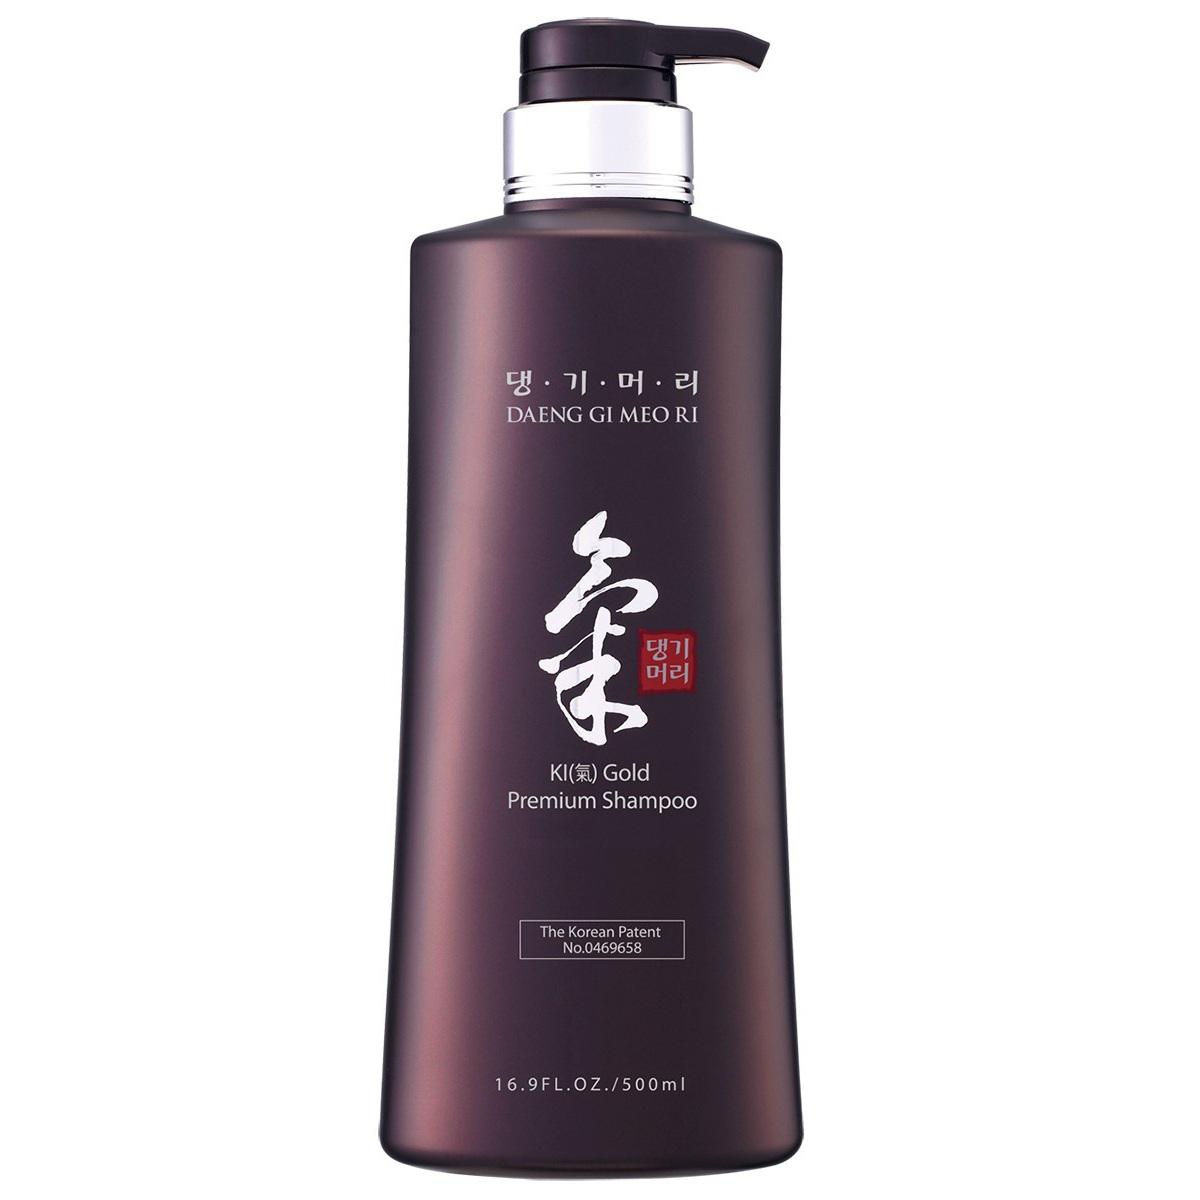 Премиум шампунь с лечебными травами Daeng Gi Meo Ri, 500мл